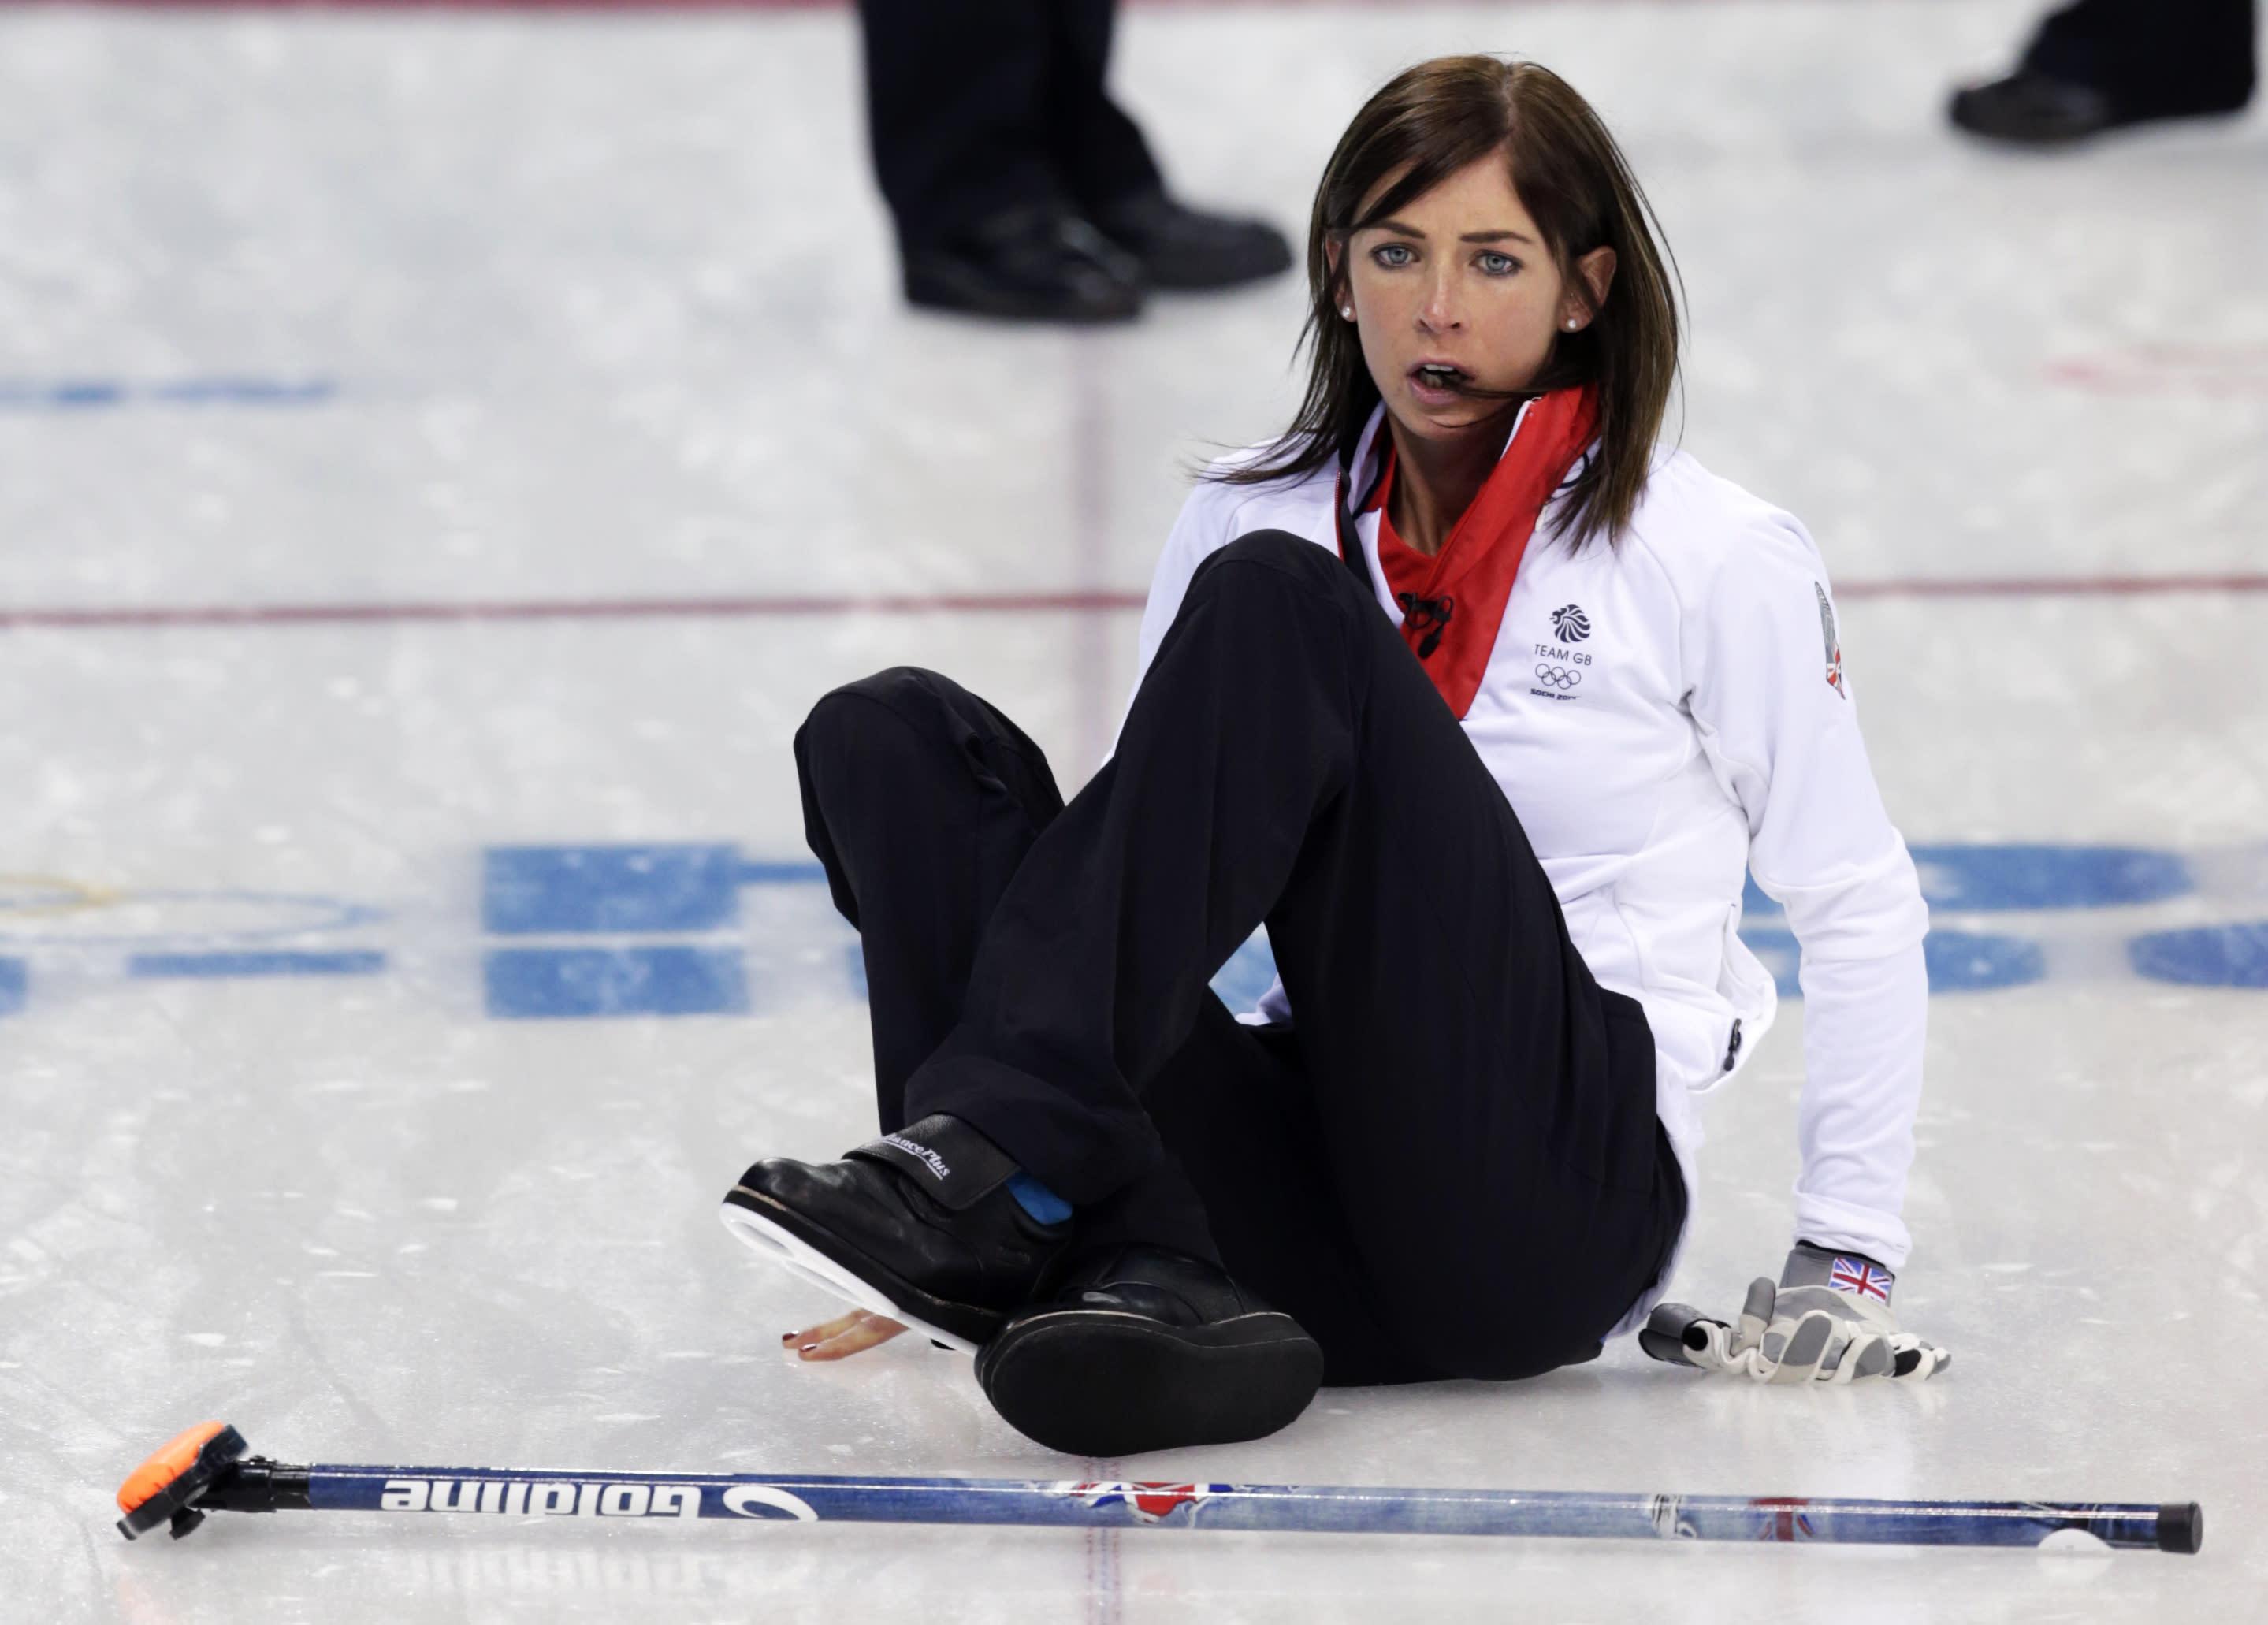 Womens curling